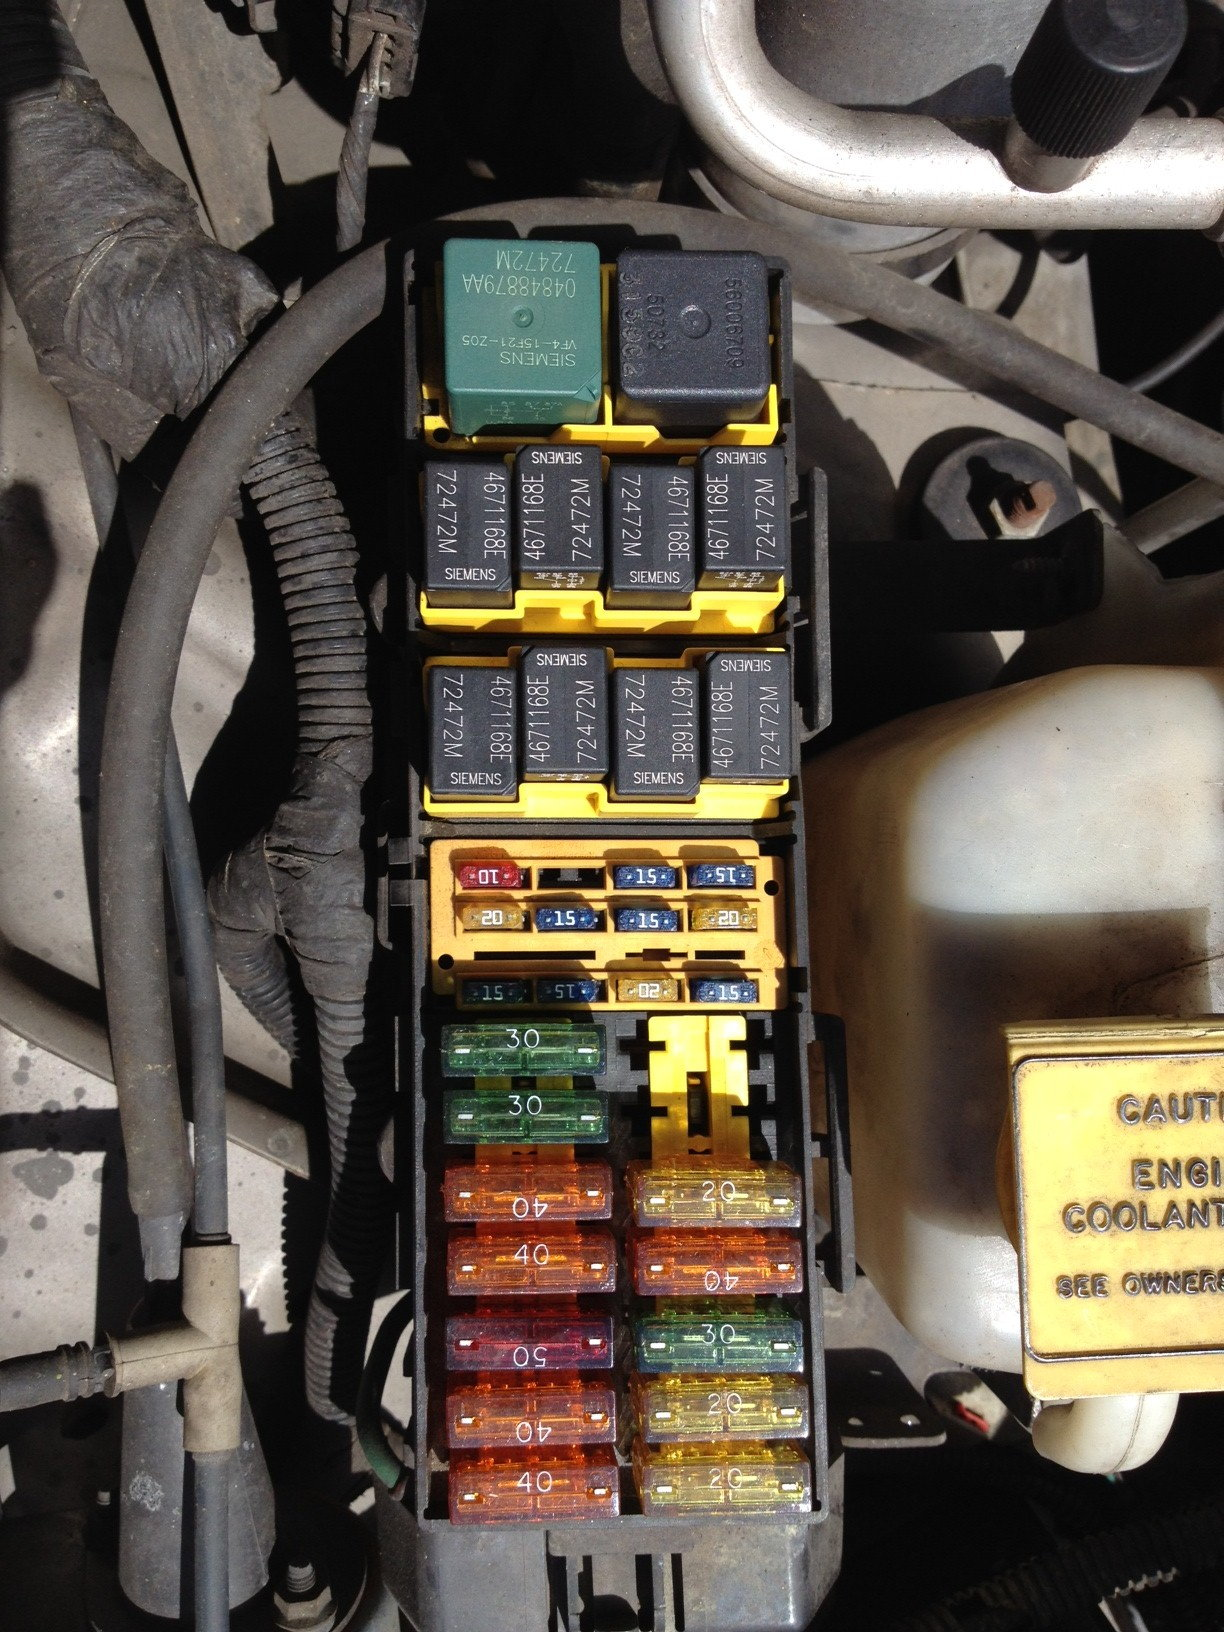 2000_Jeep_Cherokee_PDC_overhead 90966?resize=618%2C824&ssl=1 2002 jeep grand cherokee interior fuse box brokeasshome com  at bayanpartner.co